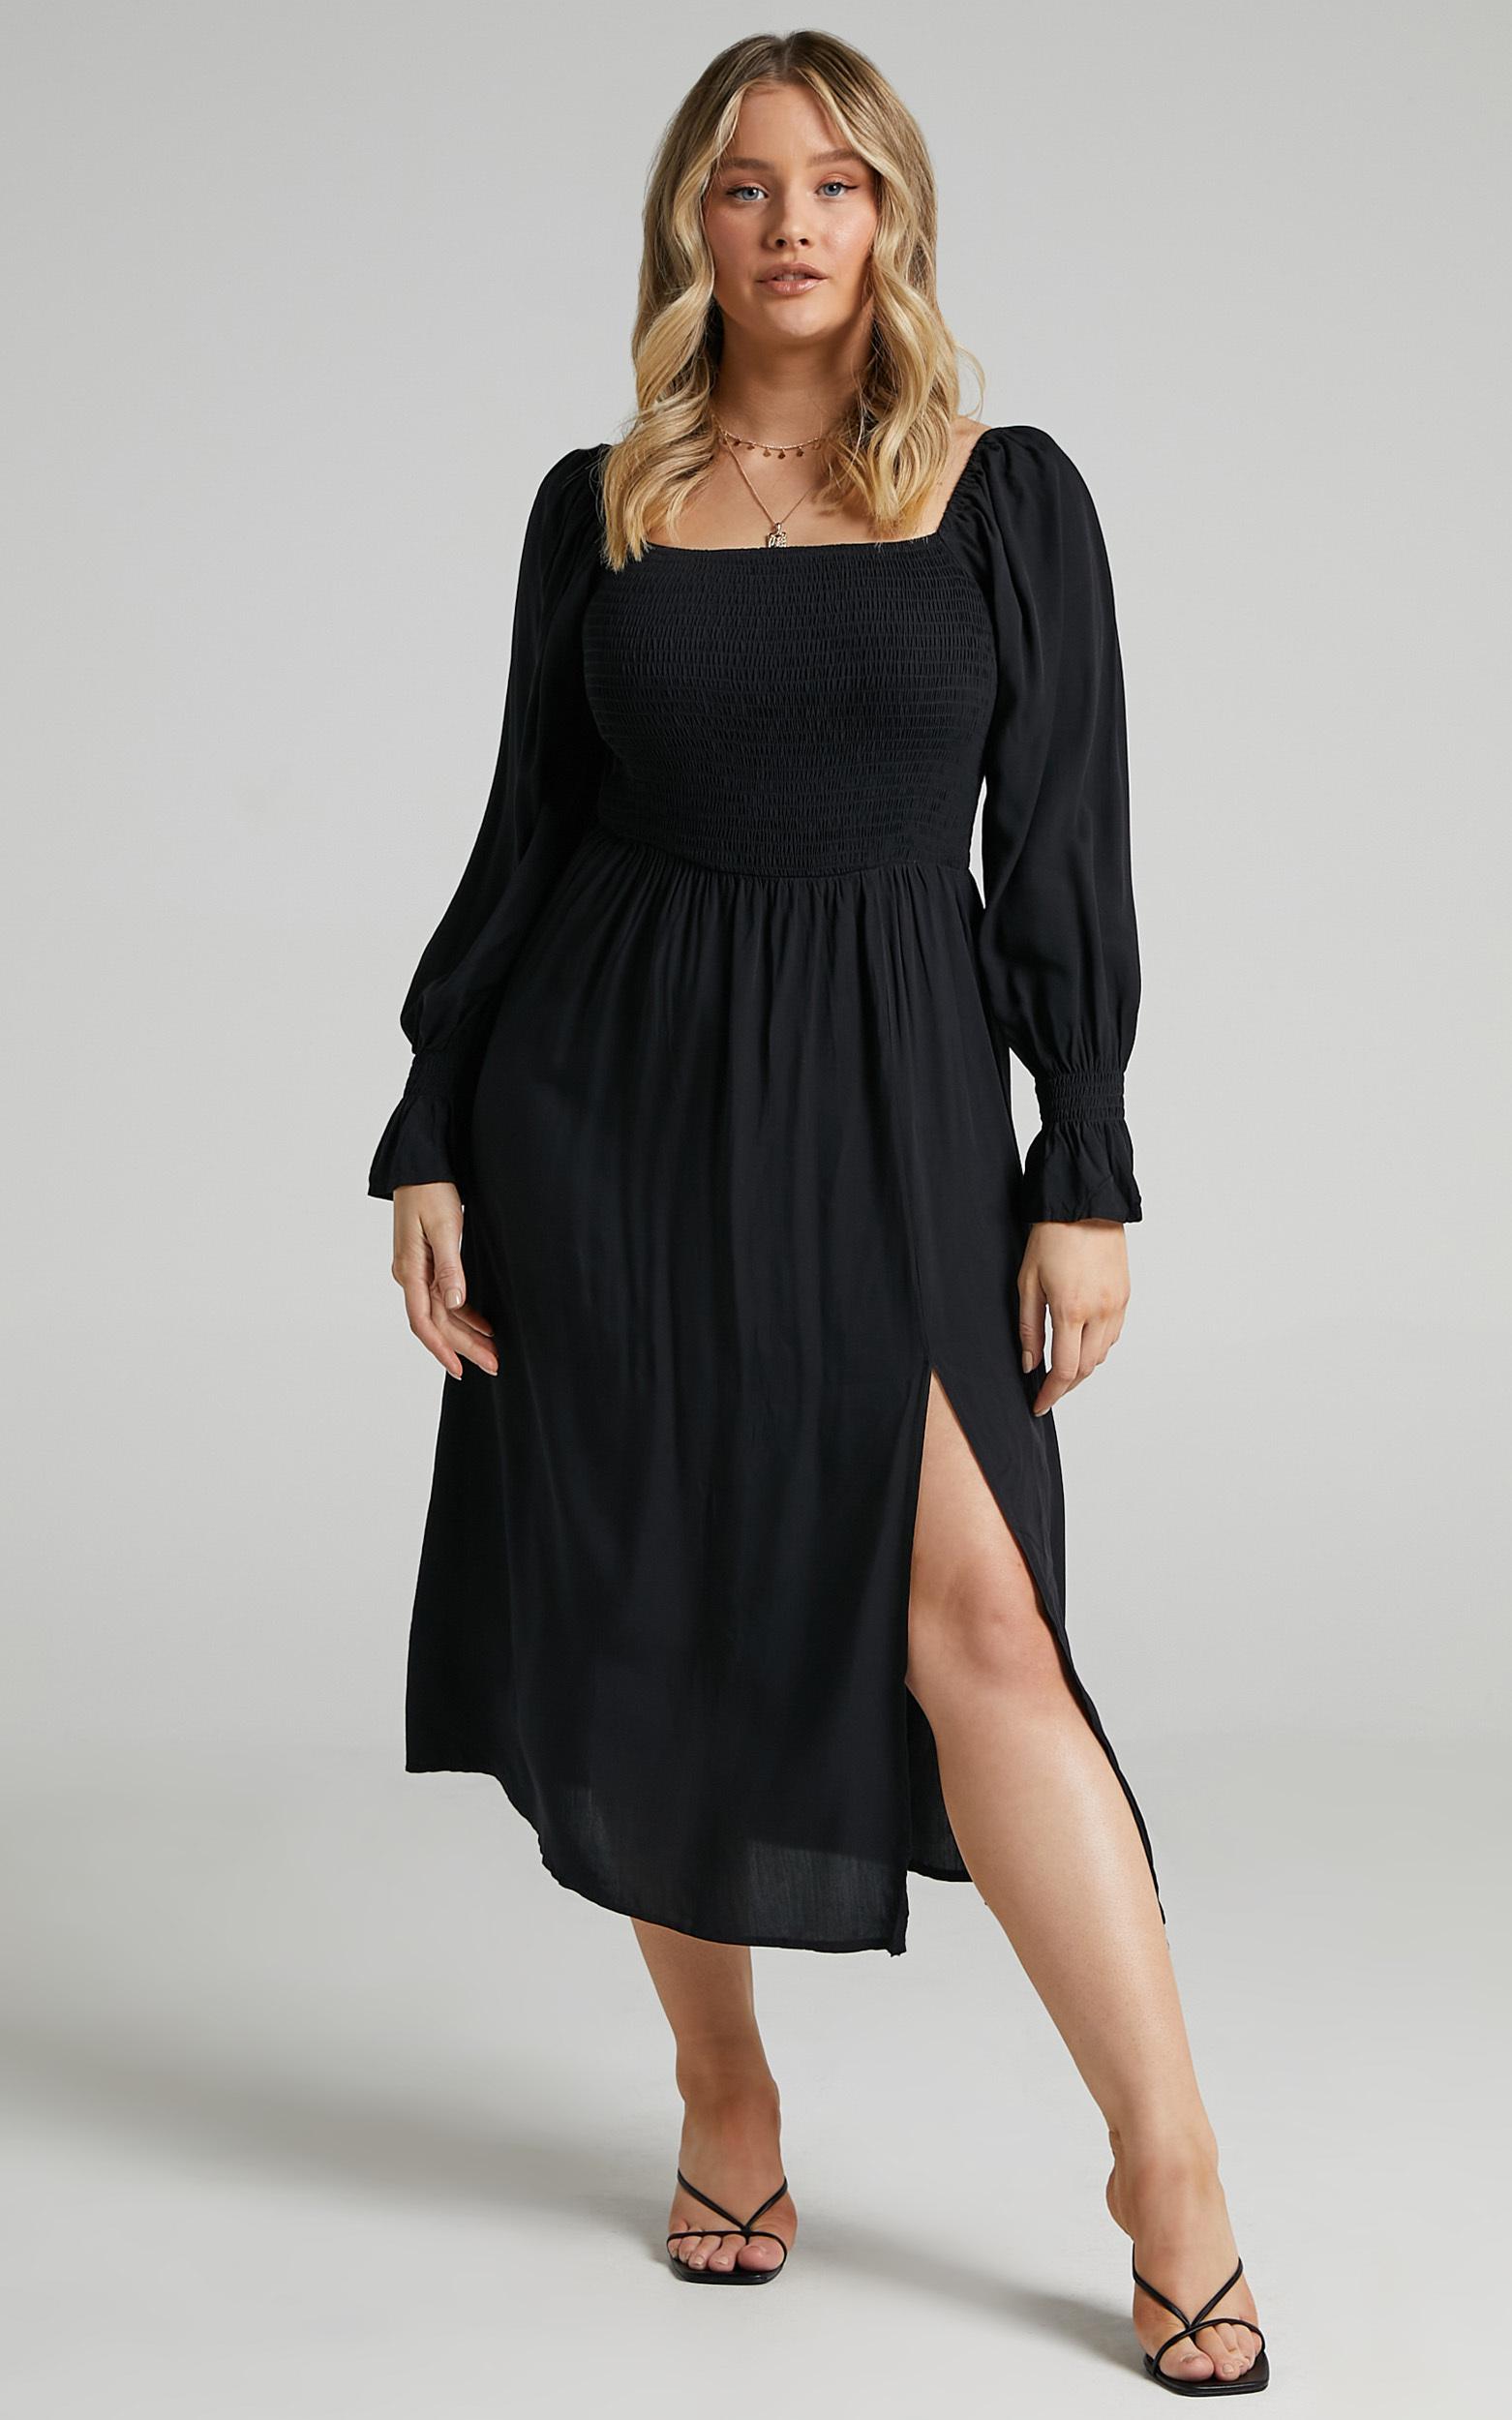 Pallas Dress in Black - 04, BLK1, hi-res image number null